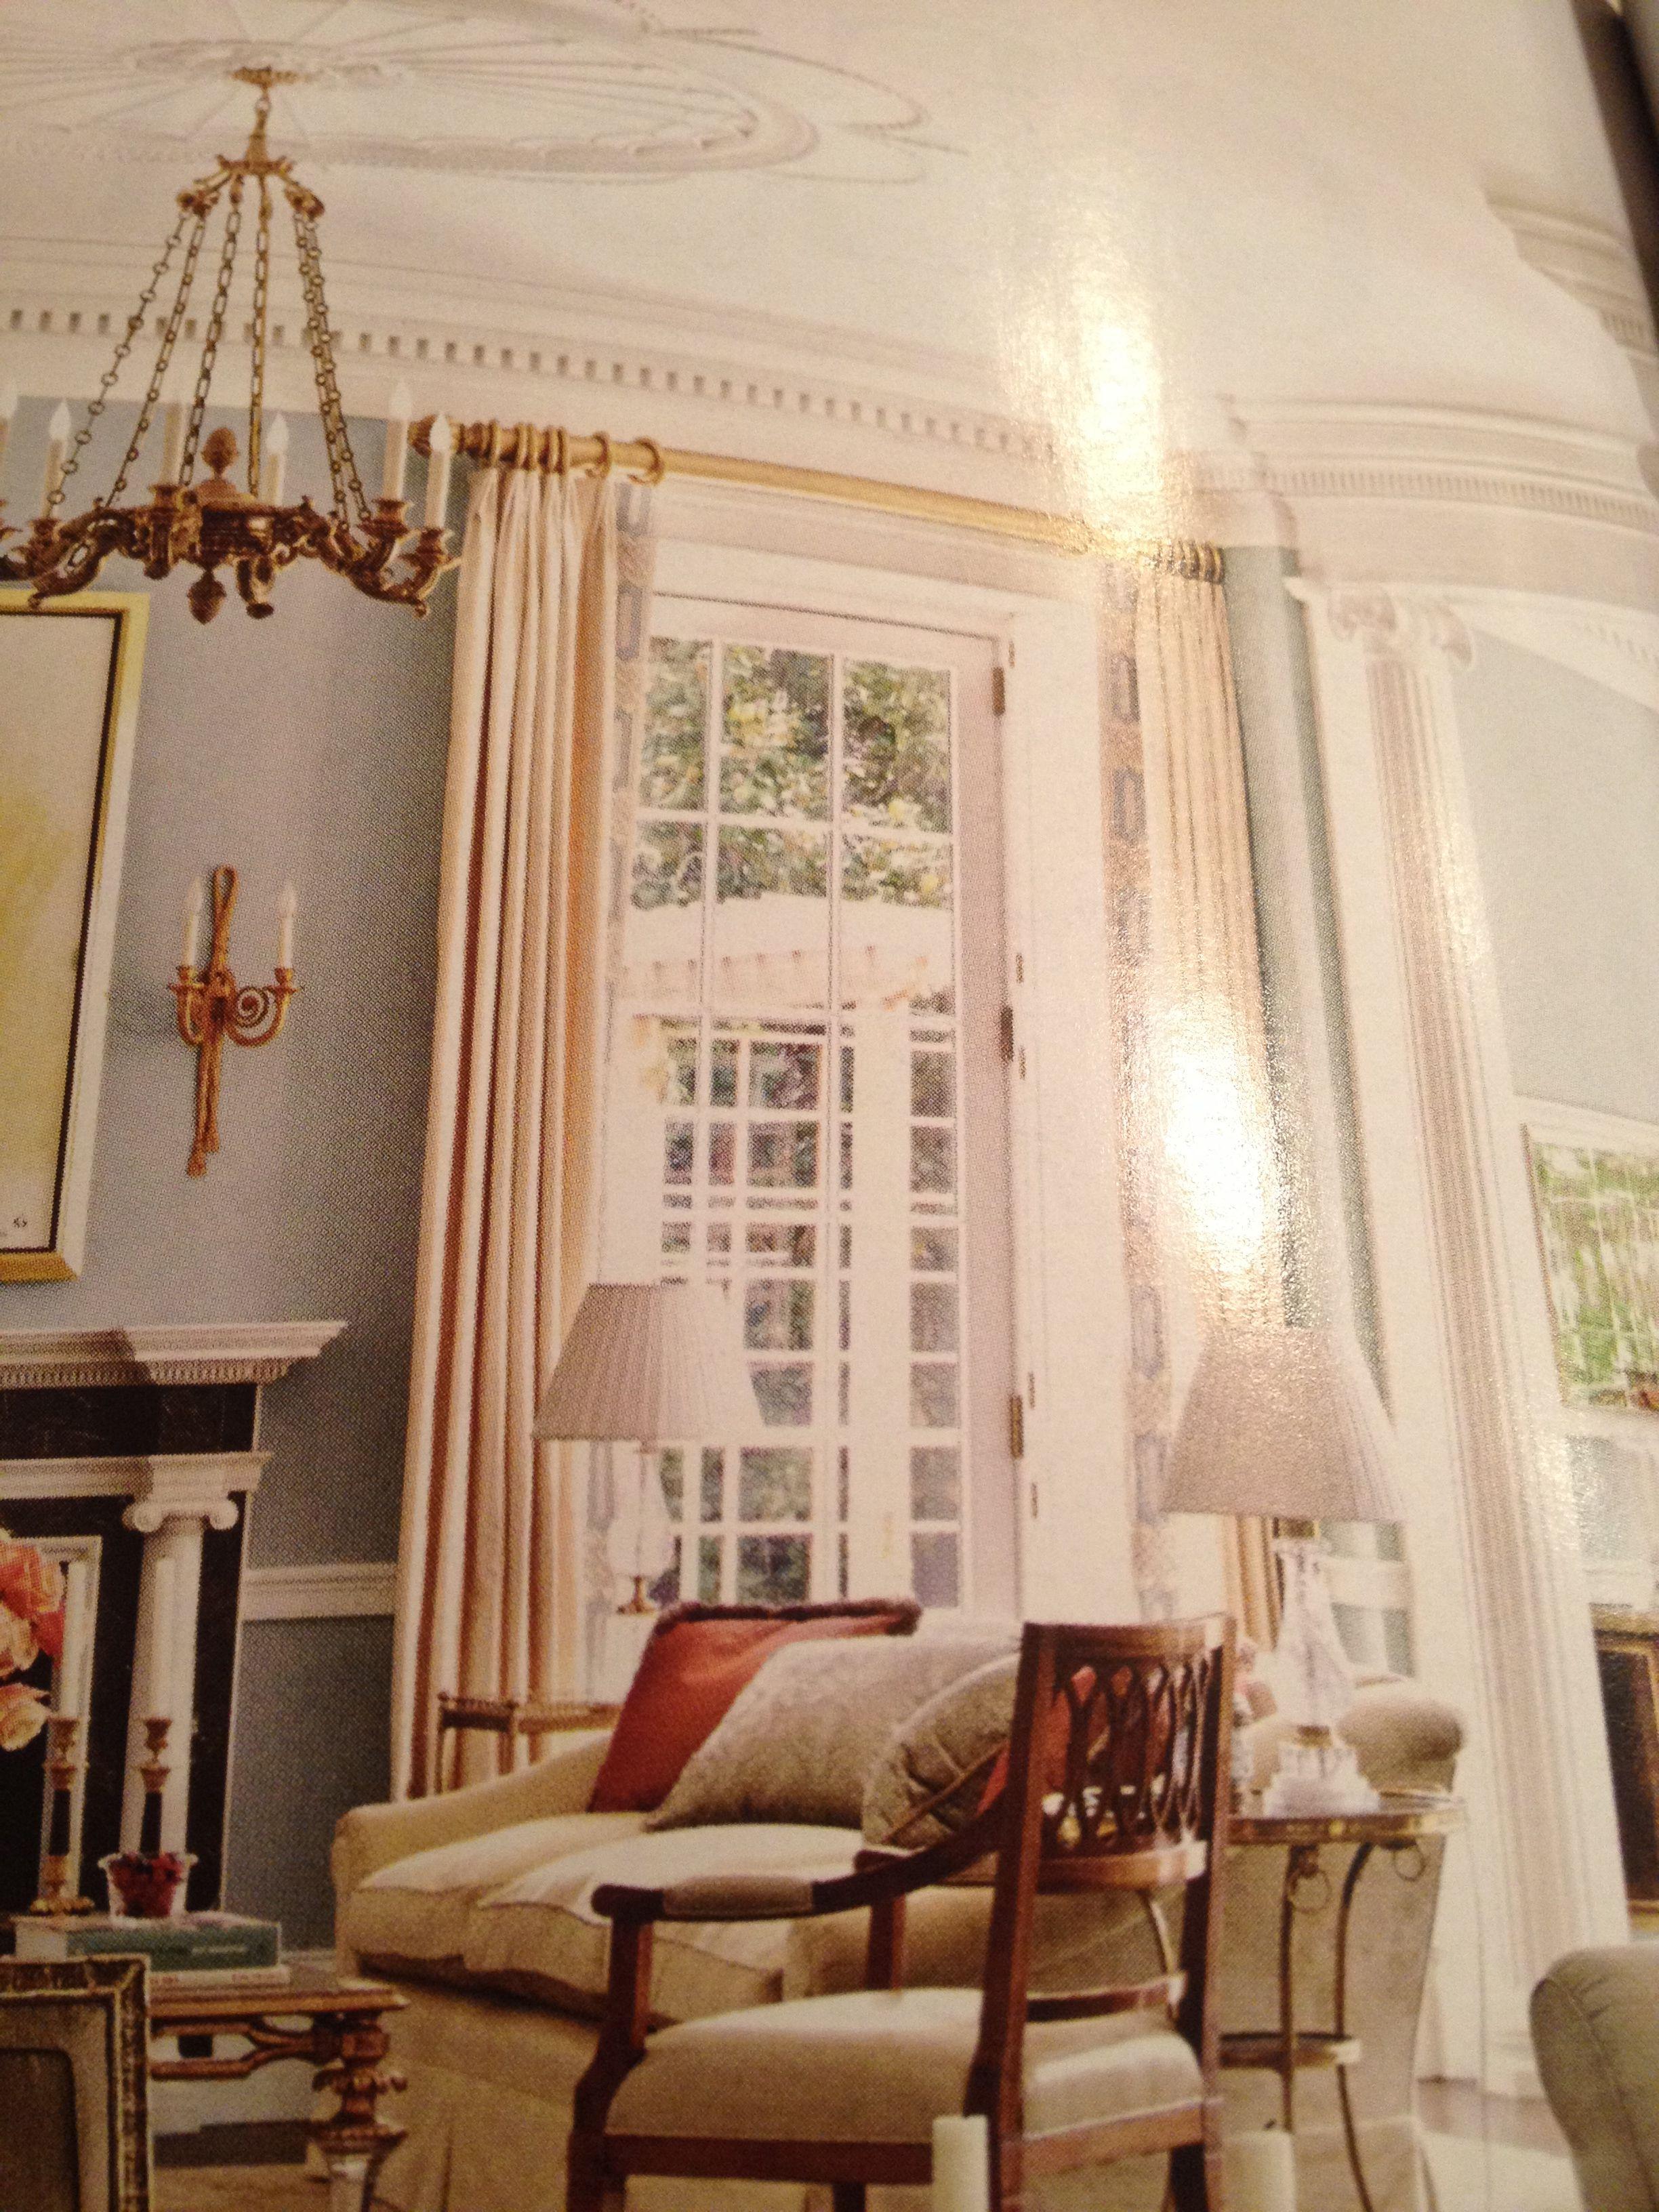 Pin by renee beyda on interiors pinterest interiors